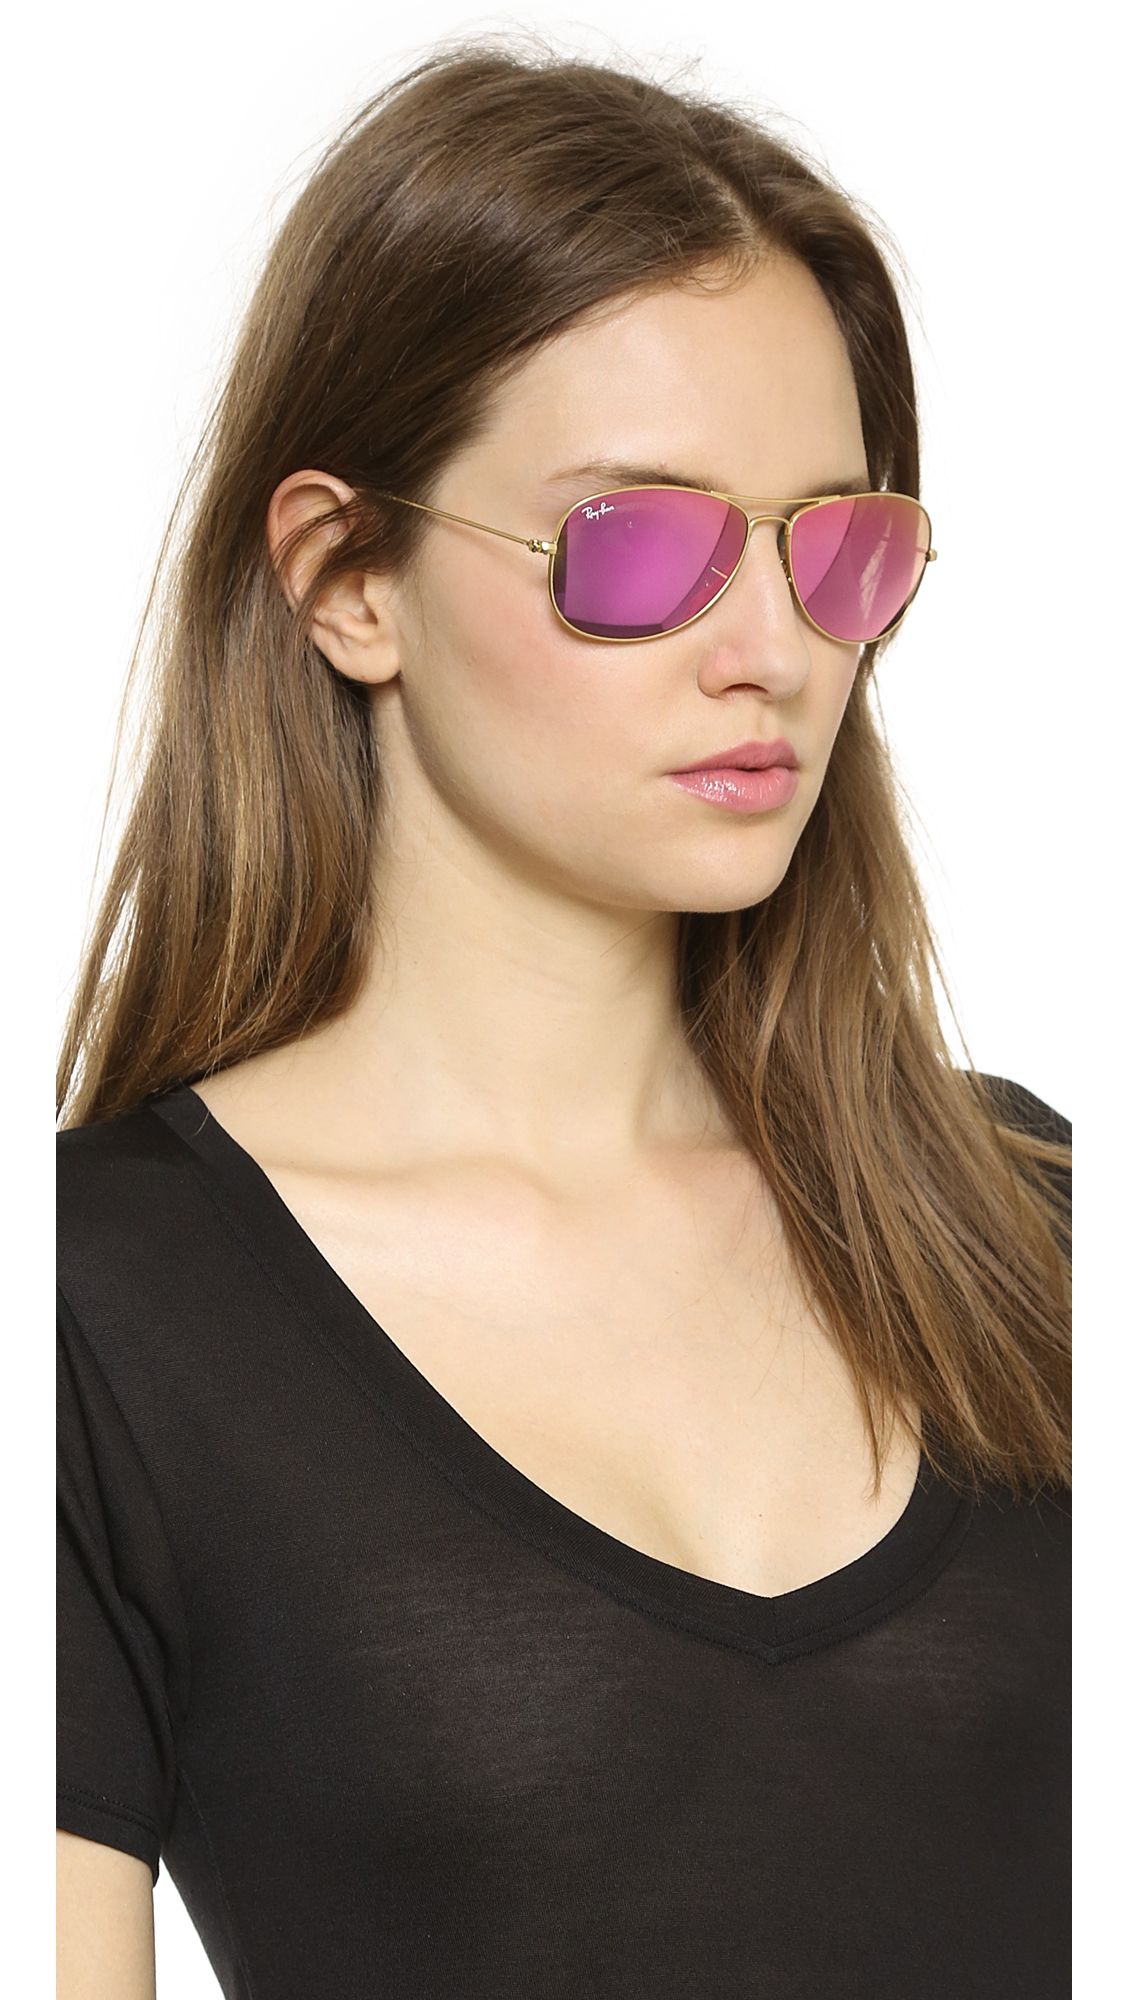 b1a995793e ray ban mens sunglasses polarized ray ban sunglasses women aviator pink